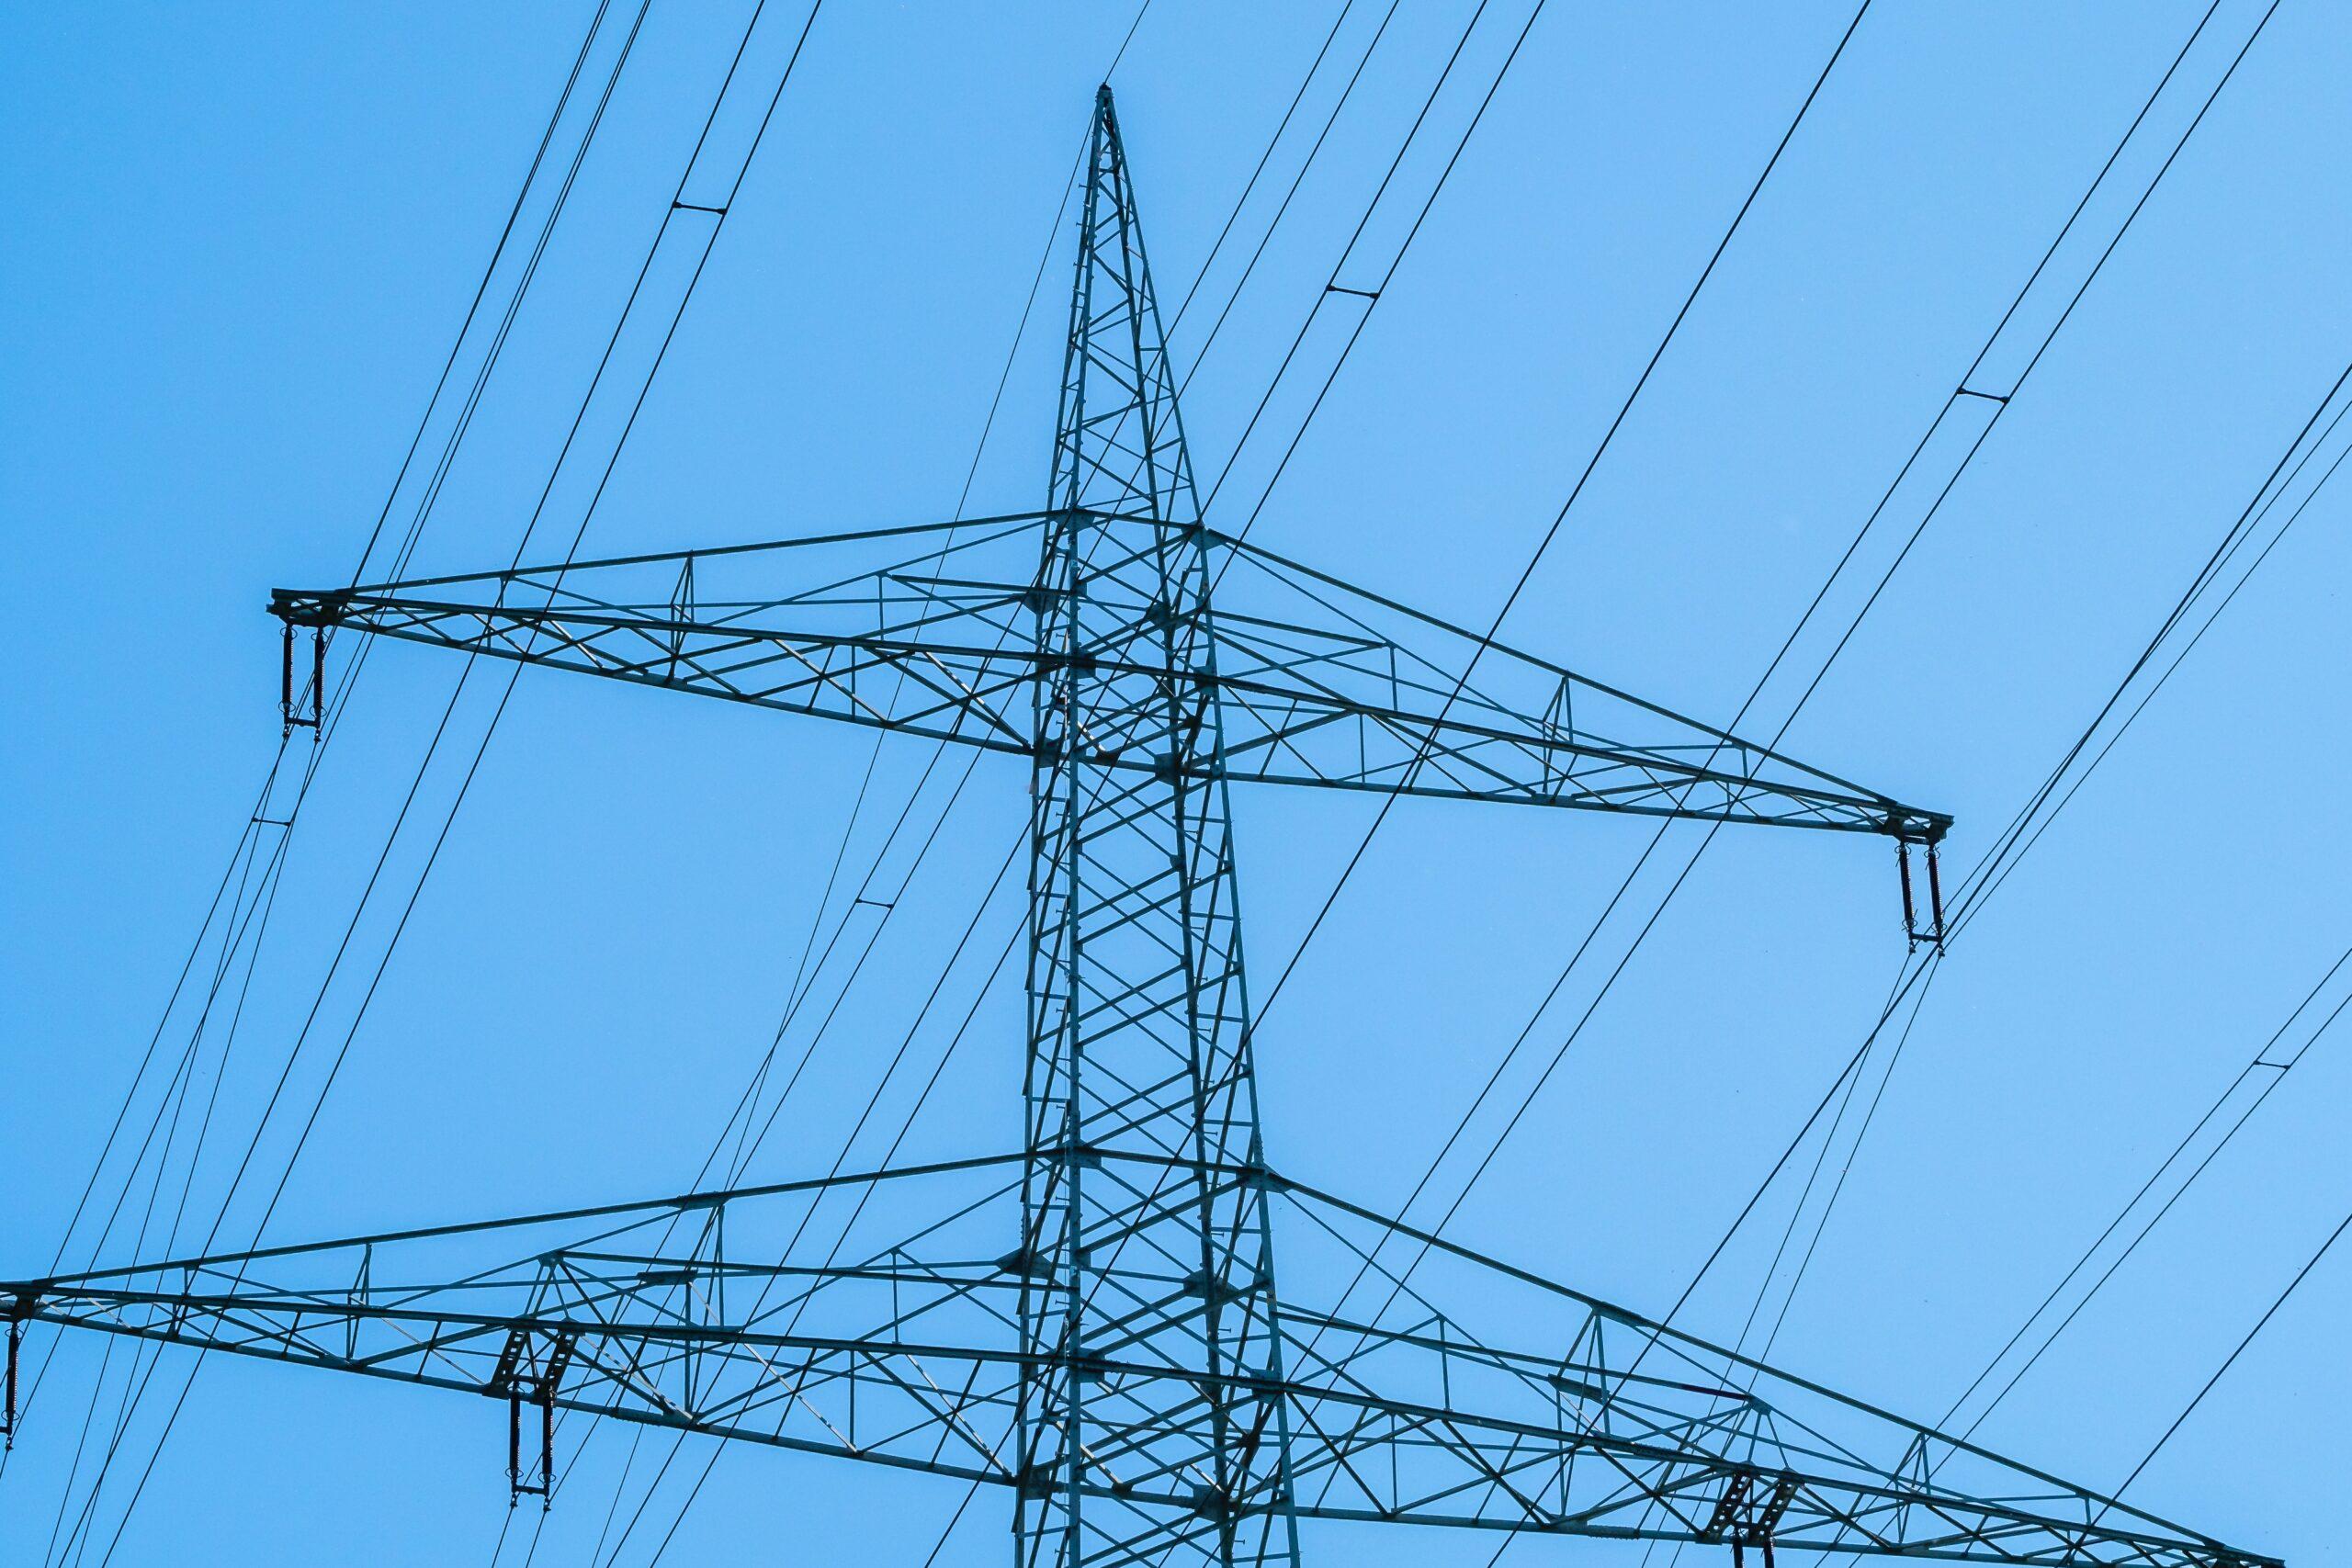 Three exciting startups providing smart grid technolgy